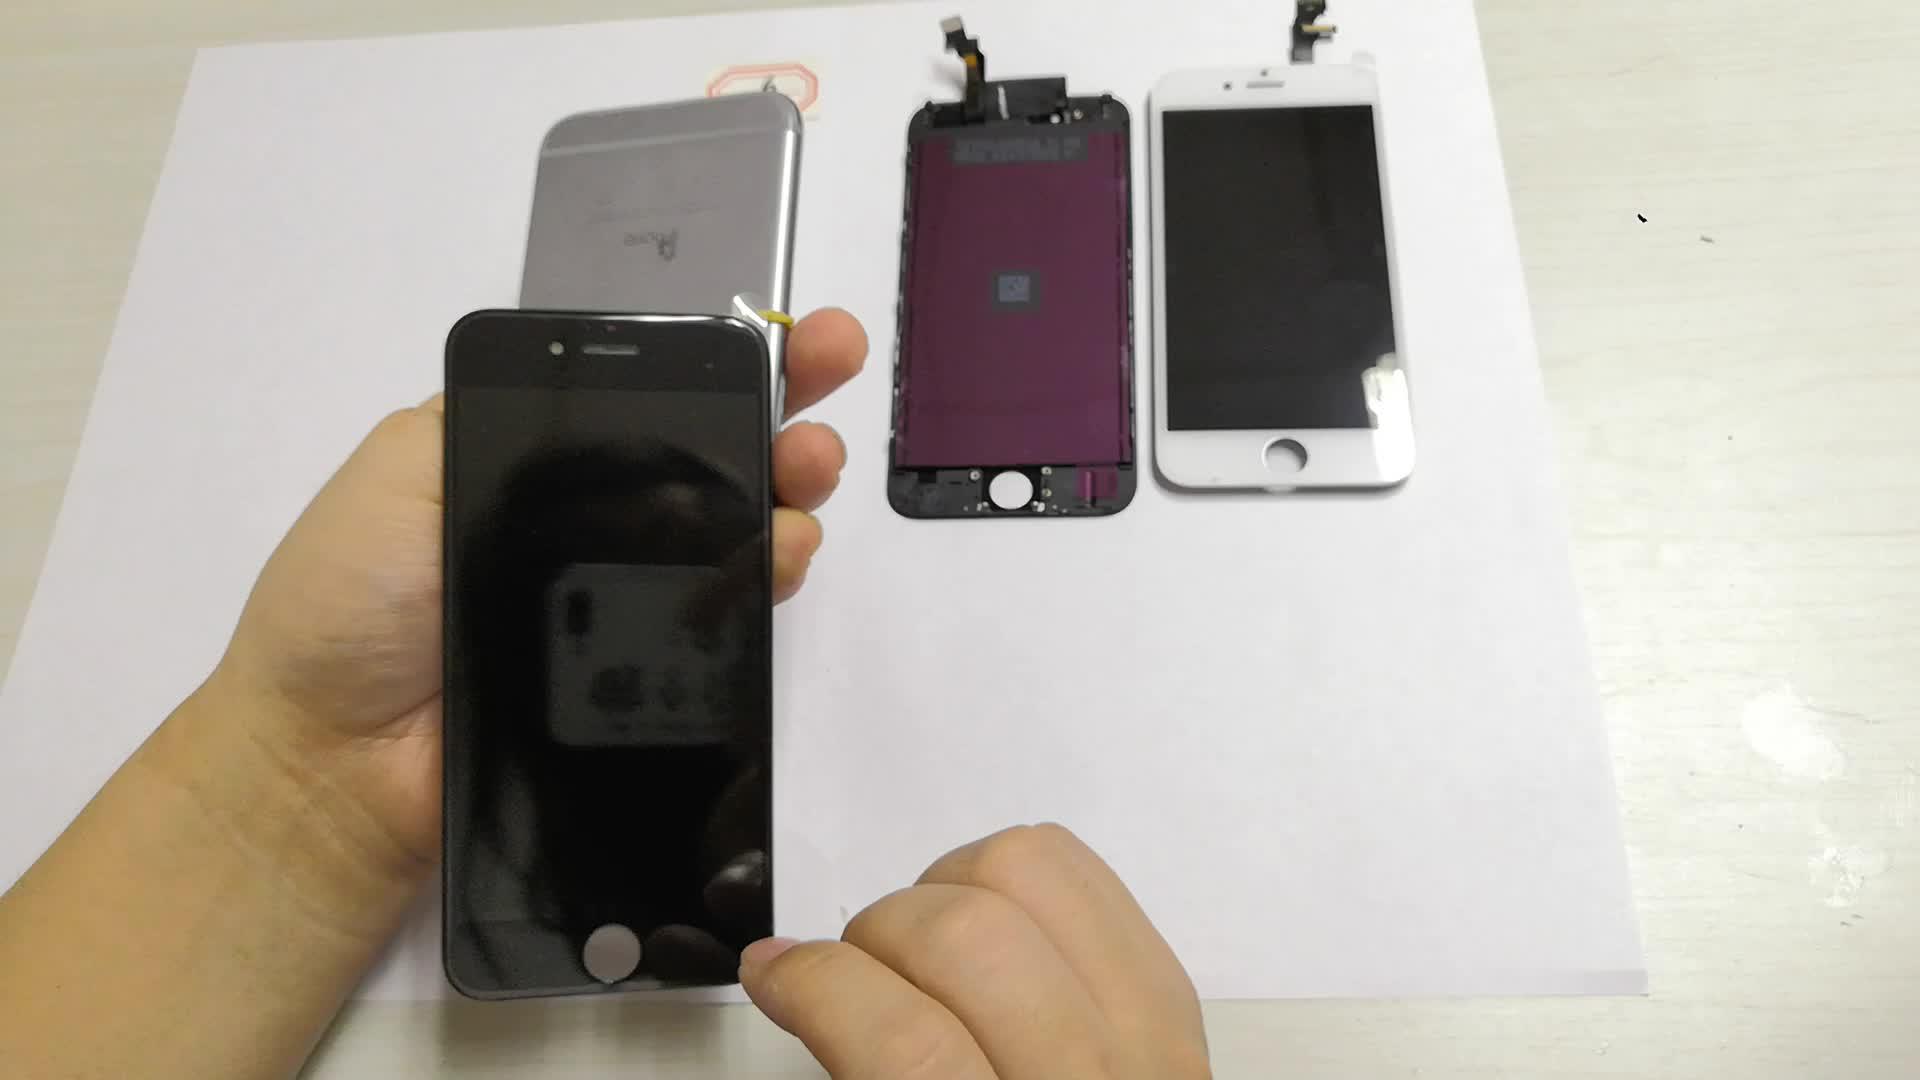 [BQ] Tianma AAA lcd para o iphone 6, preço de fábrica para o iphone 6 display, para iphone 6 tela de substituição